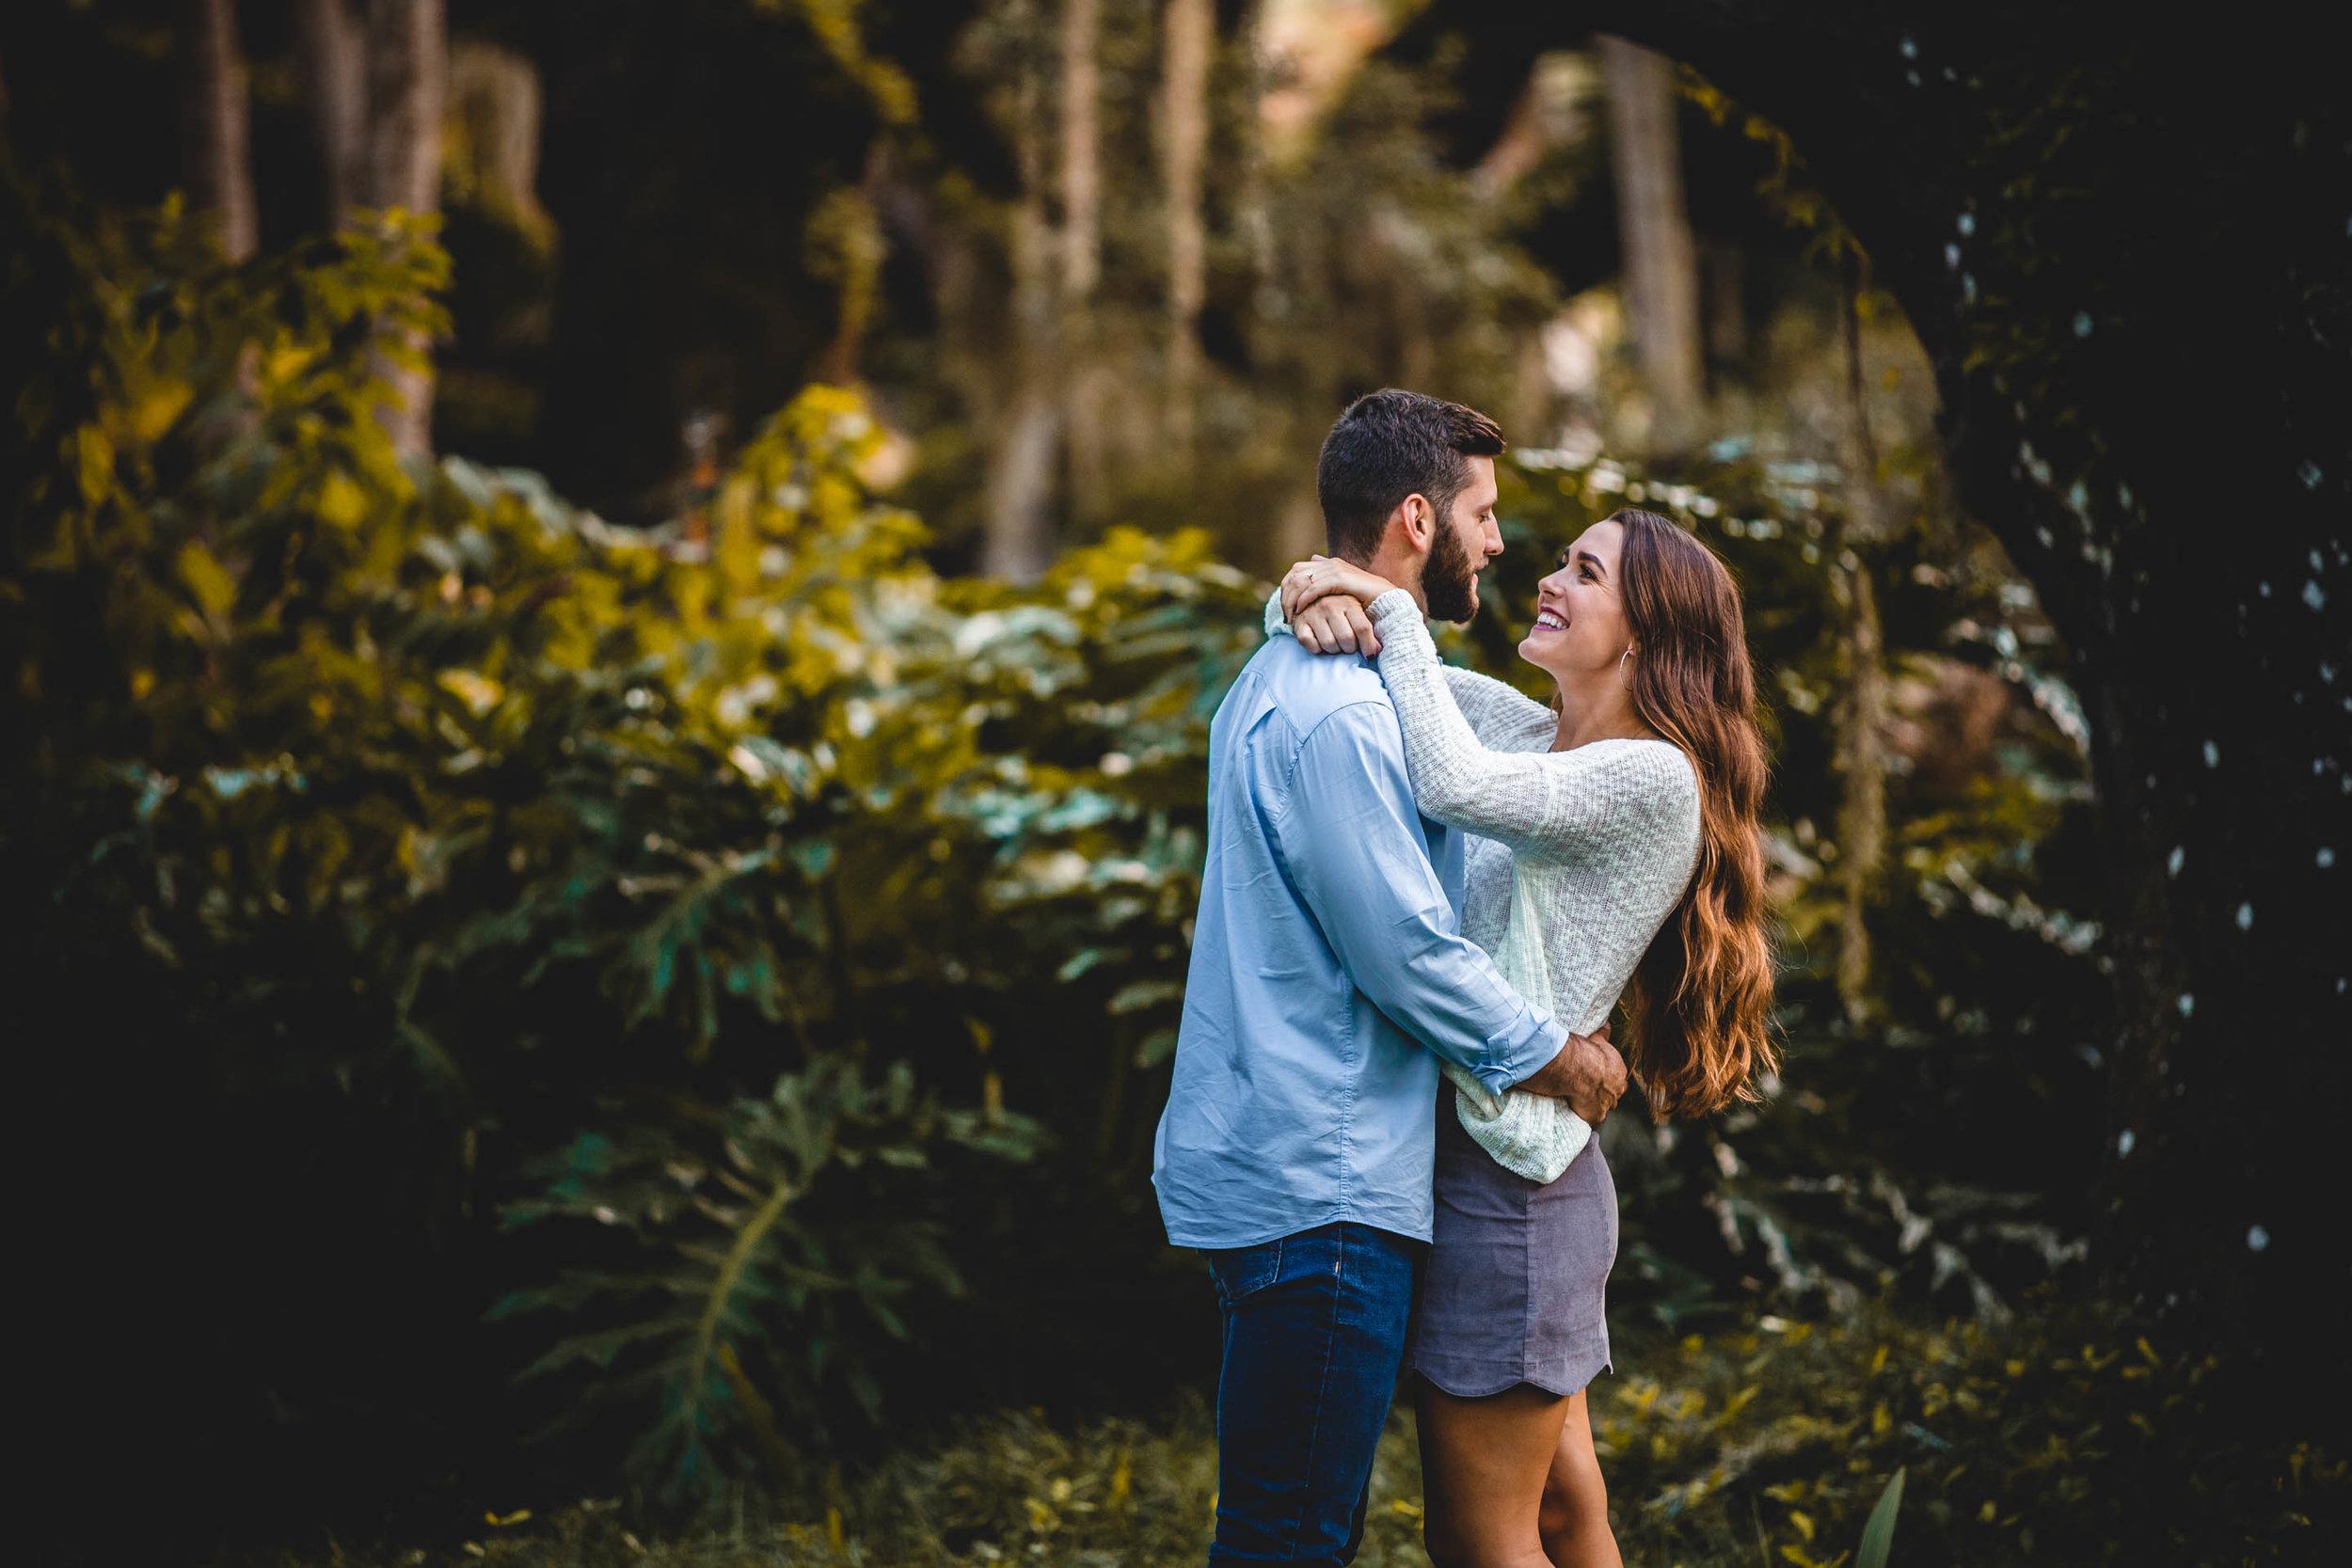 adam-szarmack-jacksonville-wedding-photographer-palm-coast-washing-oaks-garden-state-park-engagement-39.jpg